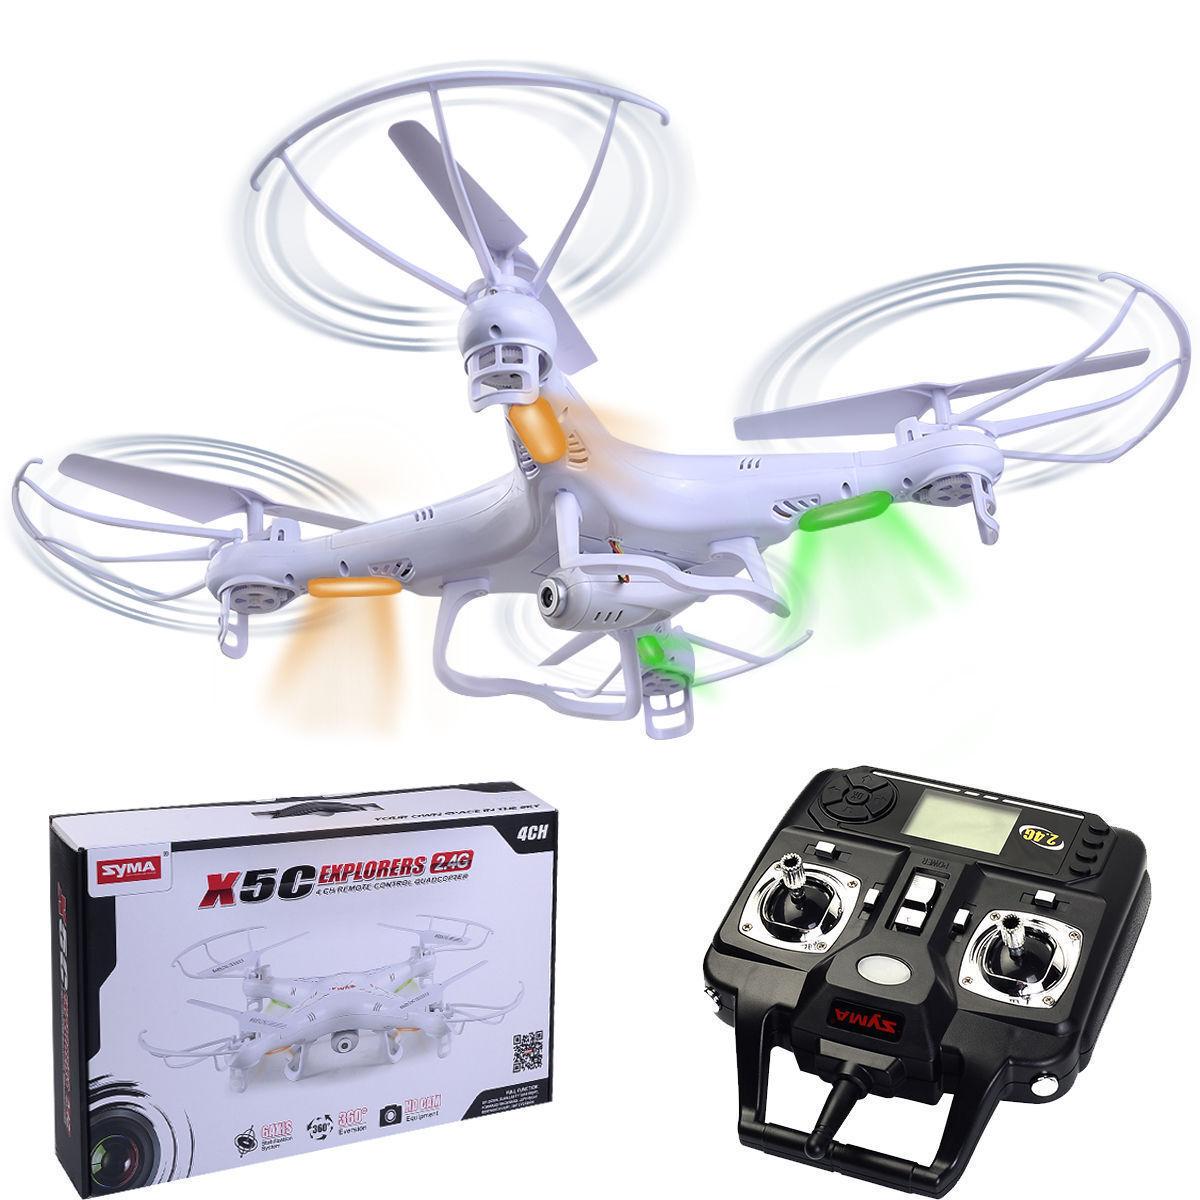 Upgraded Upgraded Upgraded Syma X5C-1 2.4Ghz 6-Axis Gyro RC Quadcopter Drone UAV RTF UFO HD Camera 191286